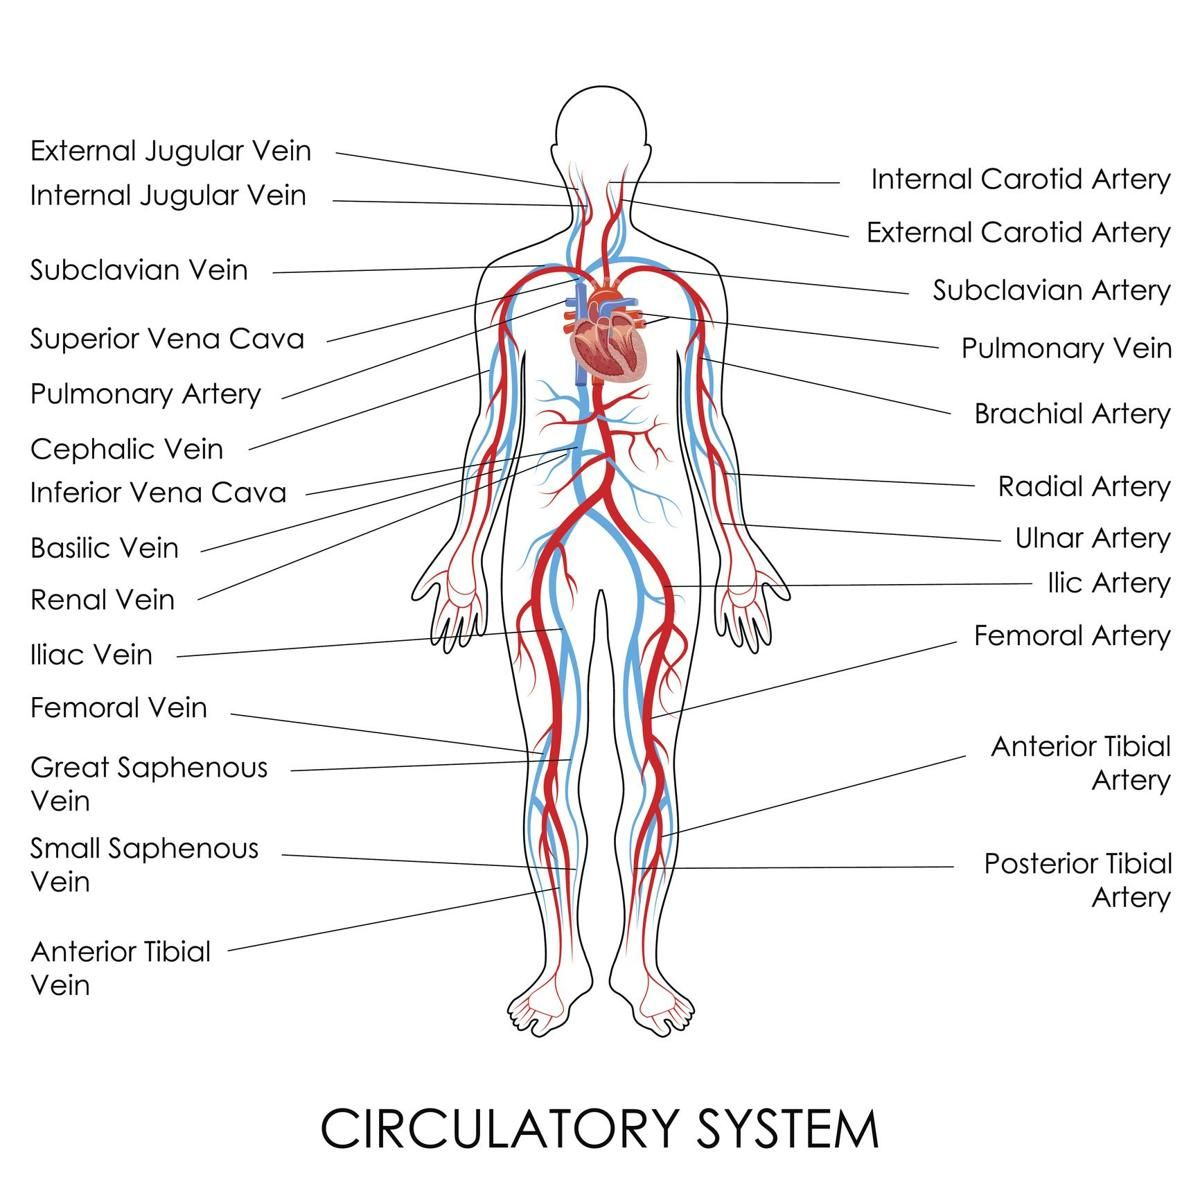 Human Circulatory System With Images Human Circulatory System